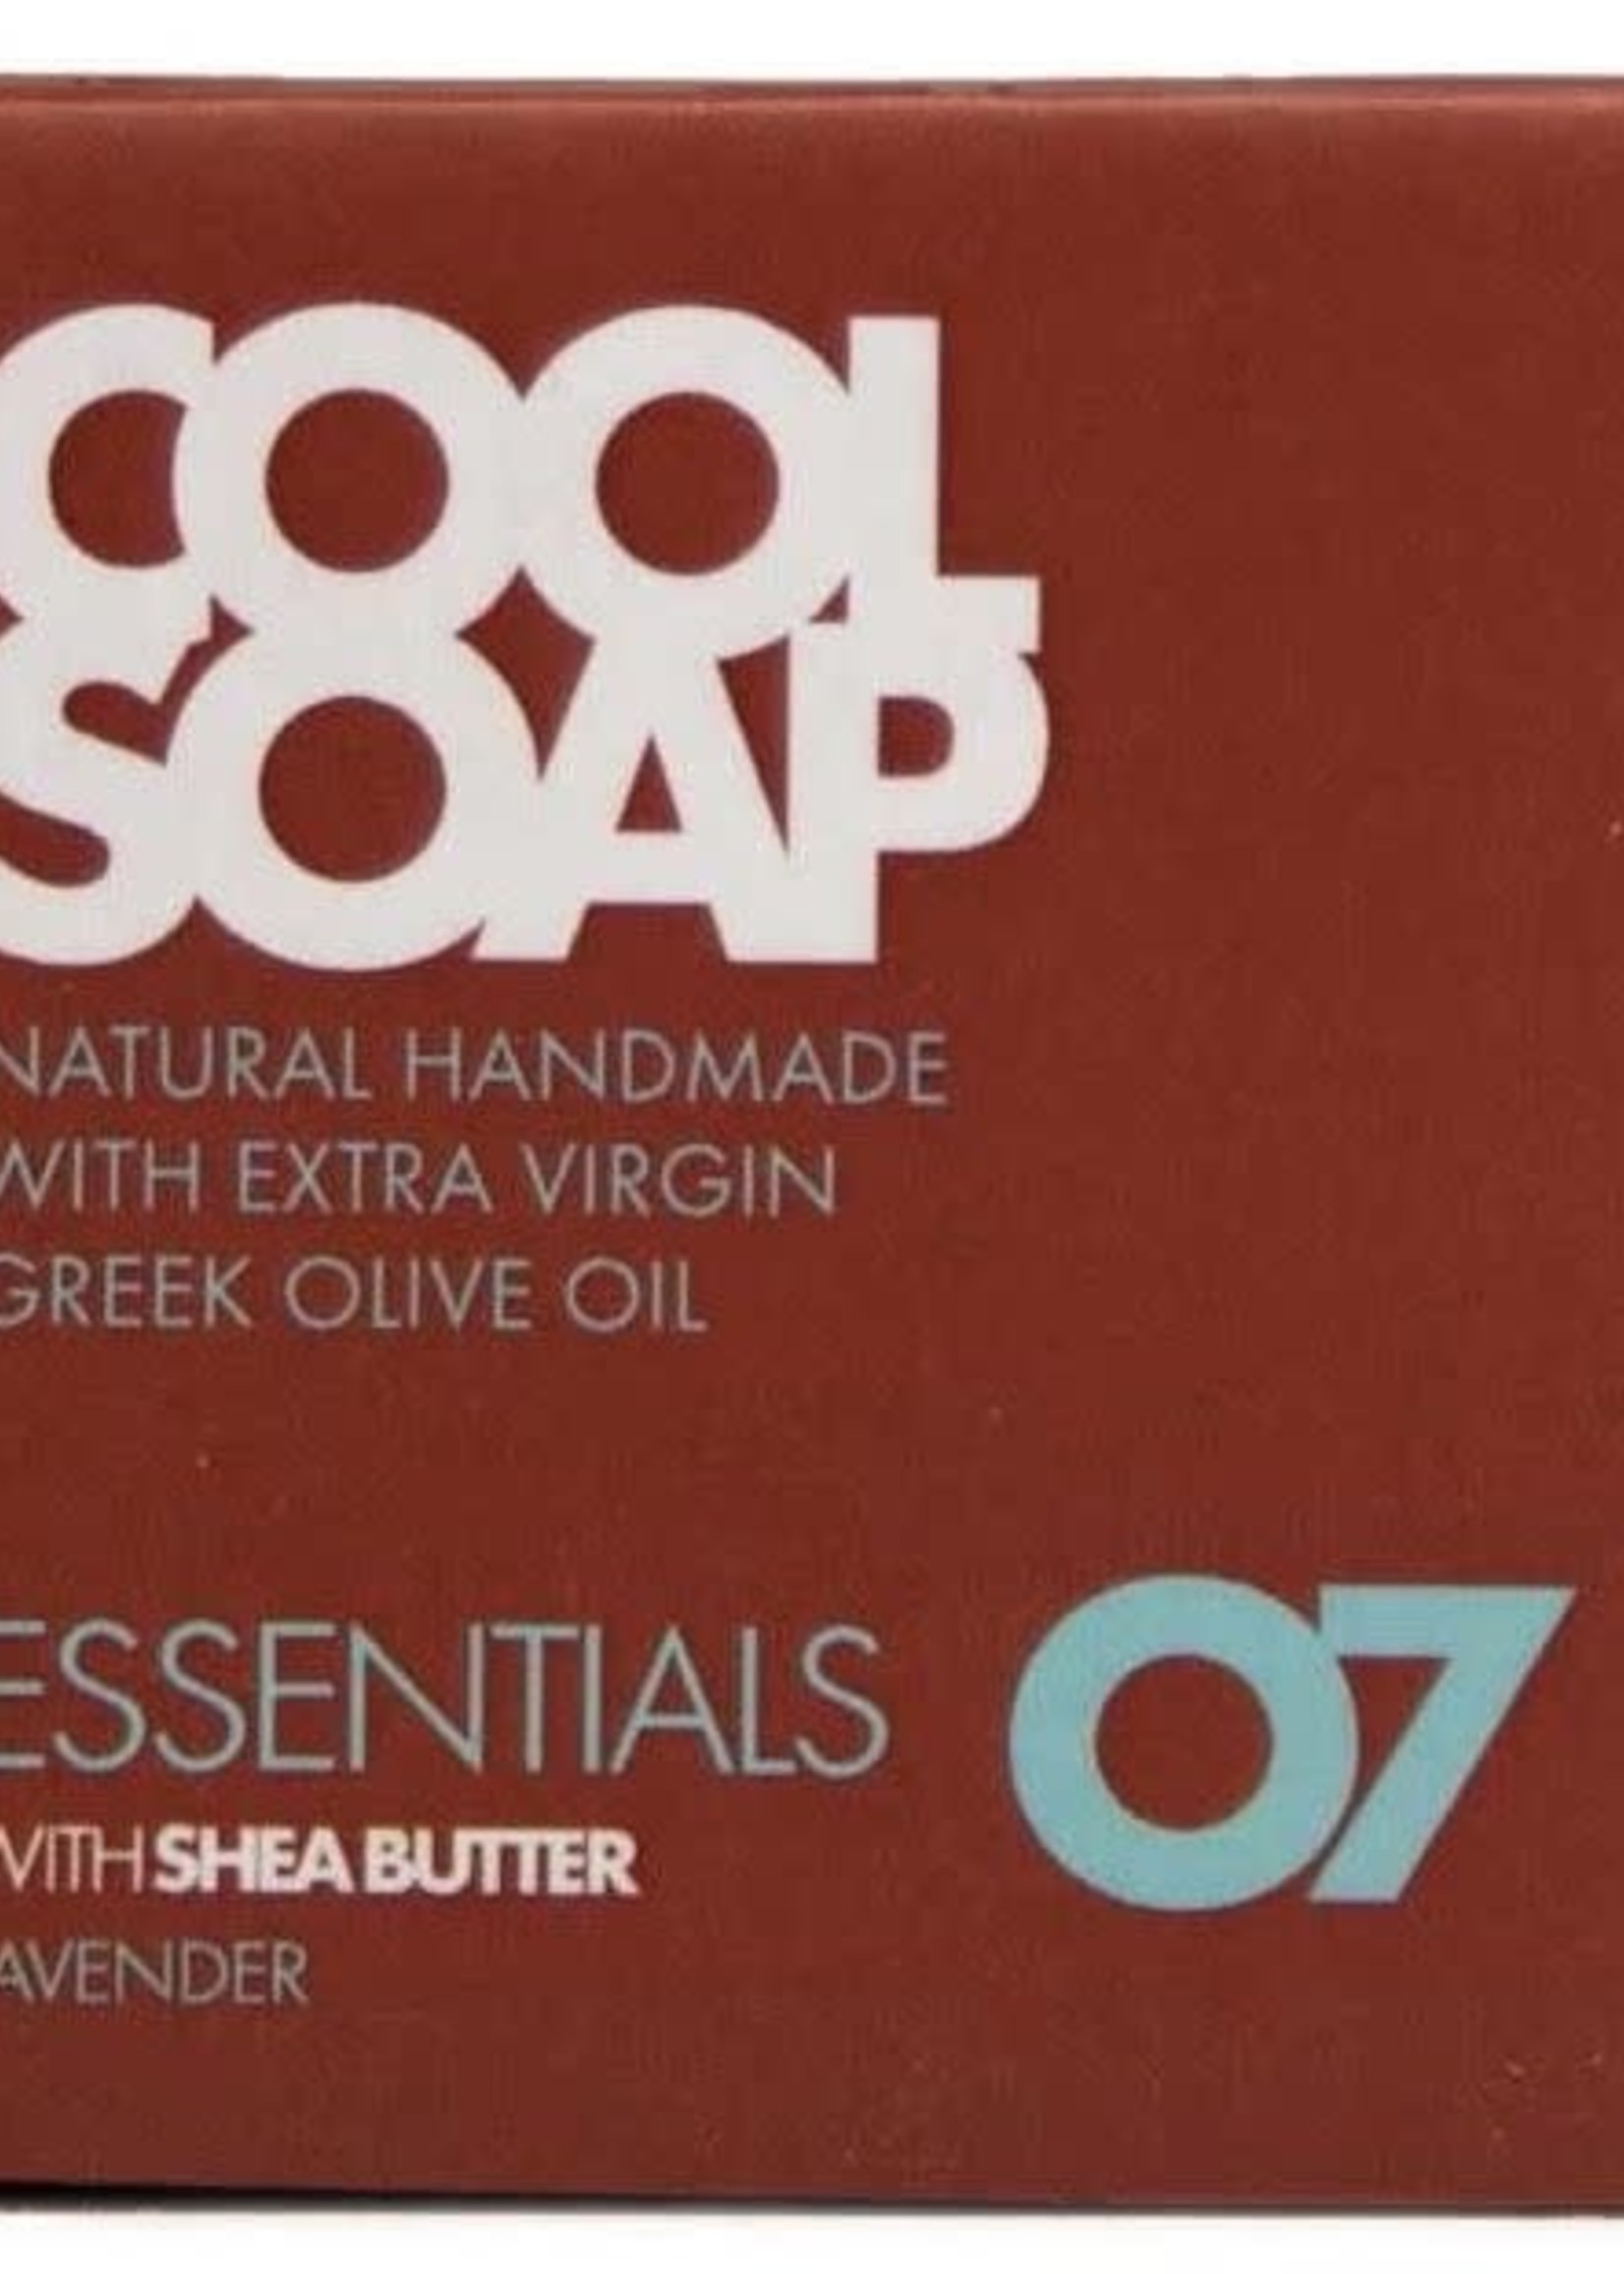 Cool Soap Cool Soap Essentials 07 - Shea Butter en Lavendel